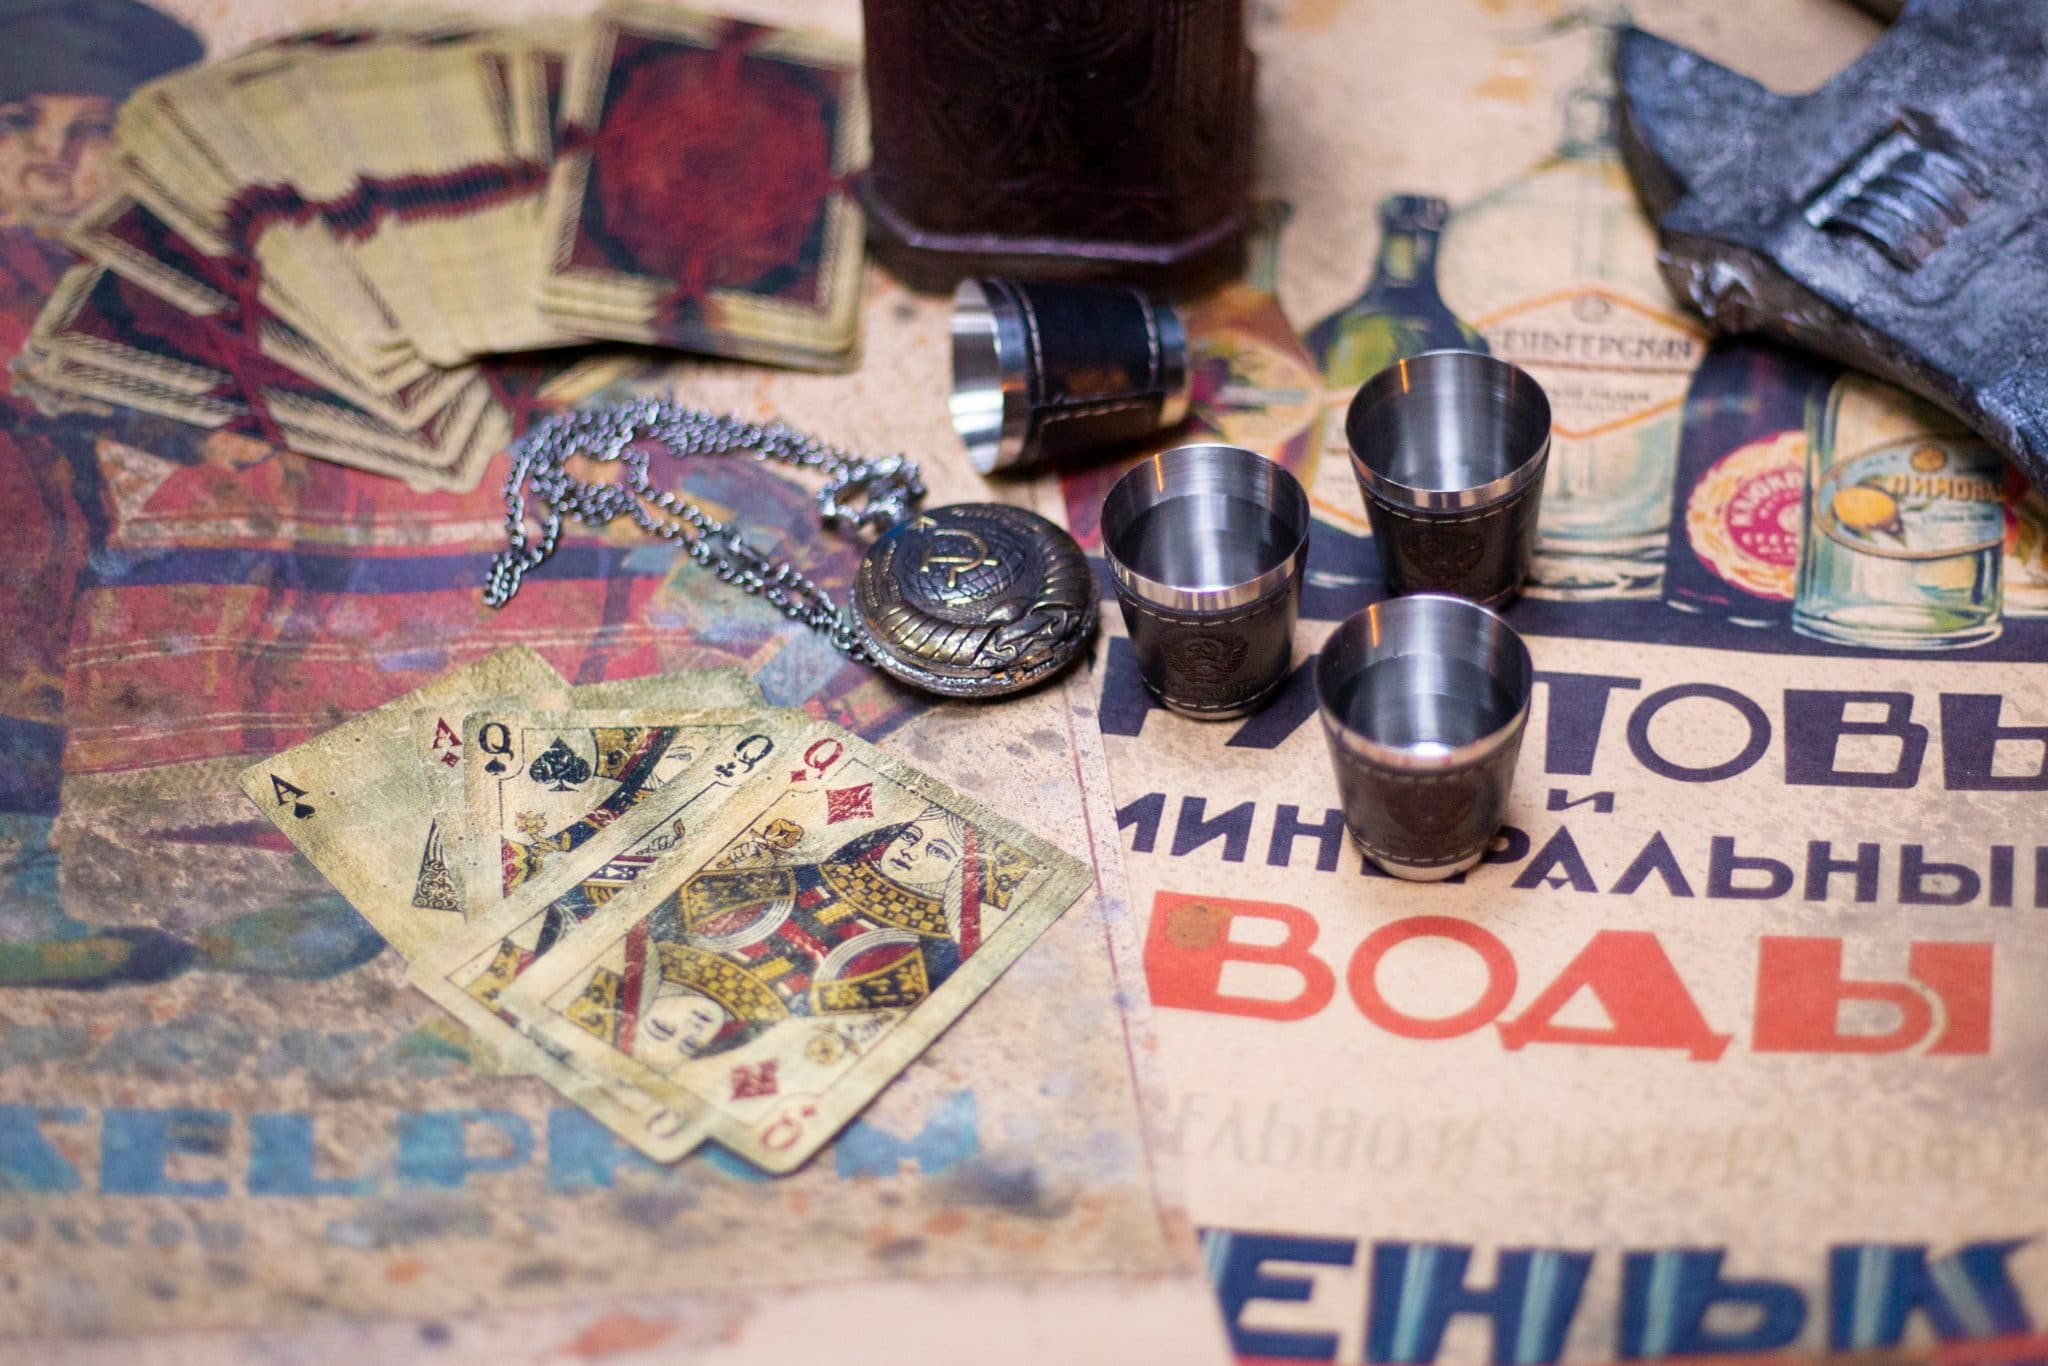 soviet club paris experience sous marin